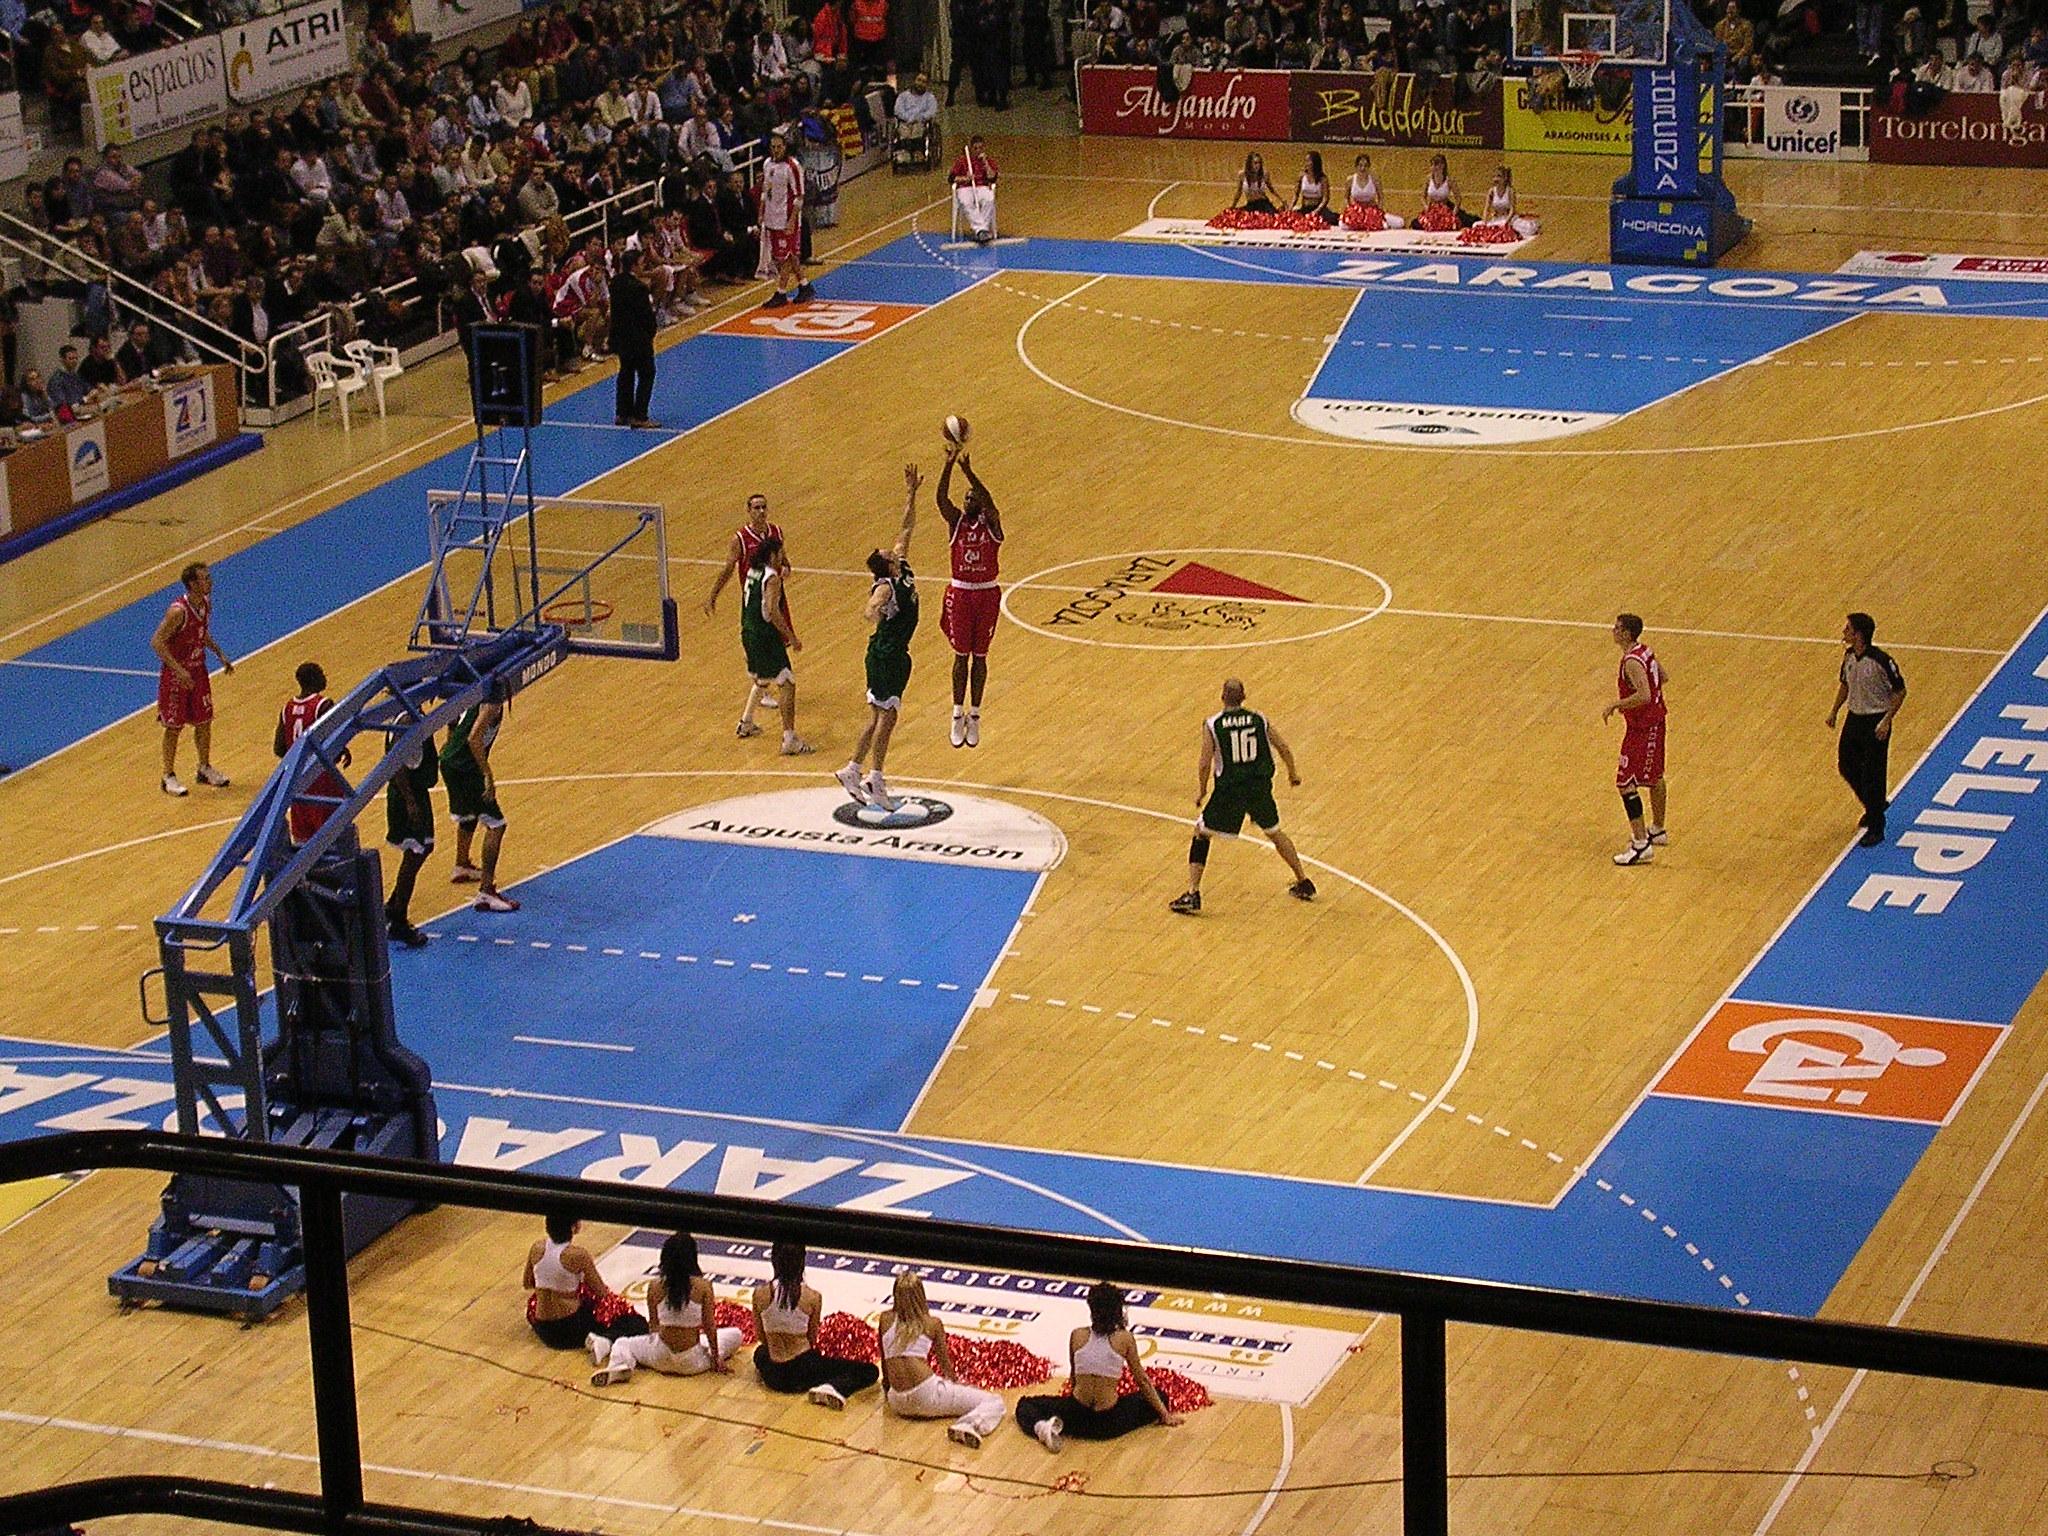 d098b74bf6 Basquetebol – Wikipédia